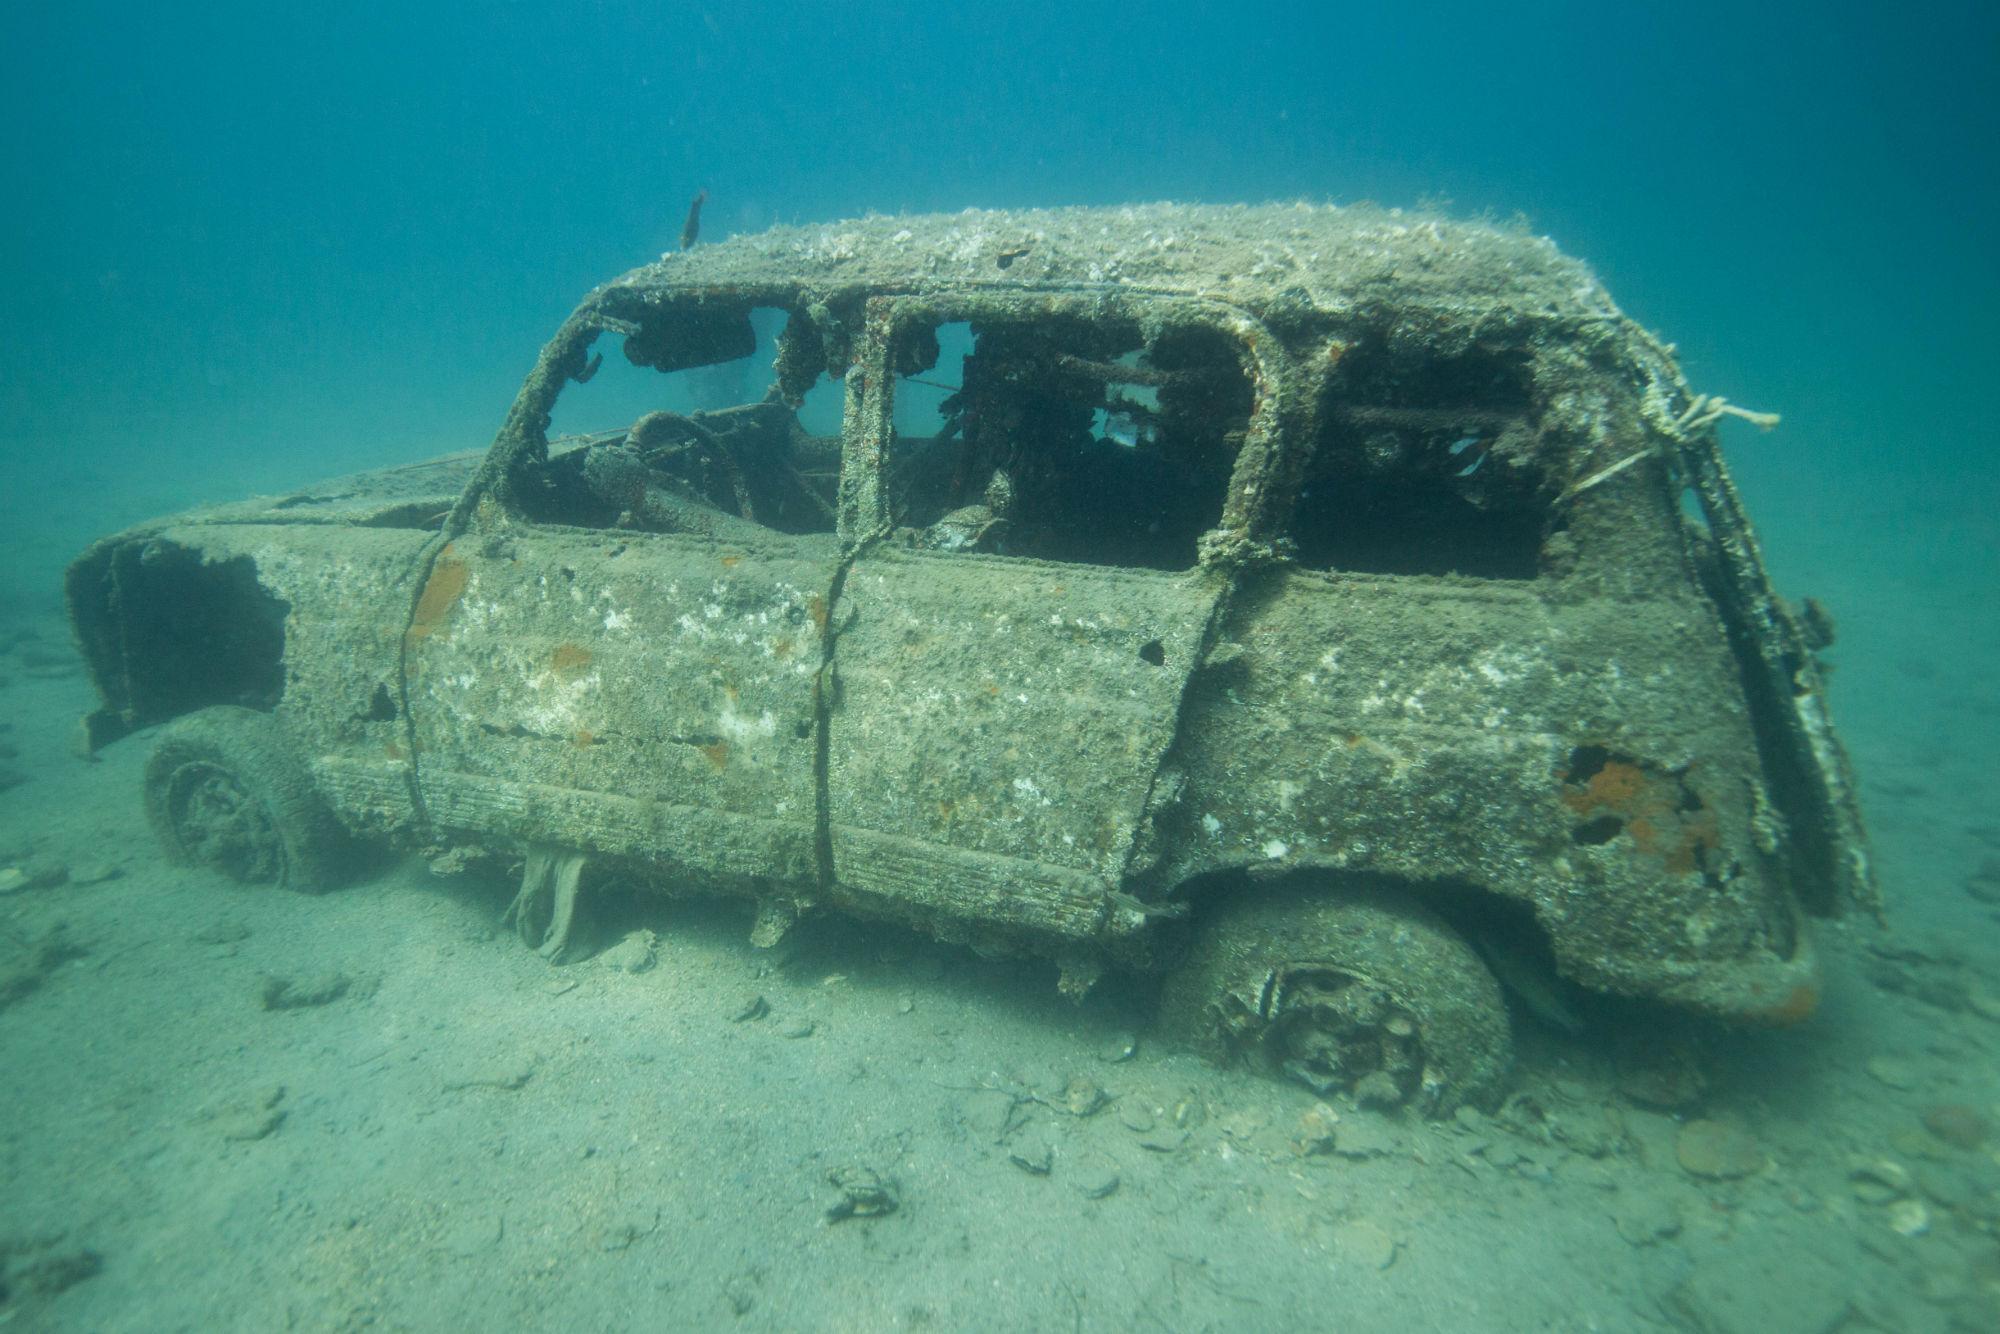 Underwater Car In Slovenia